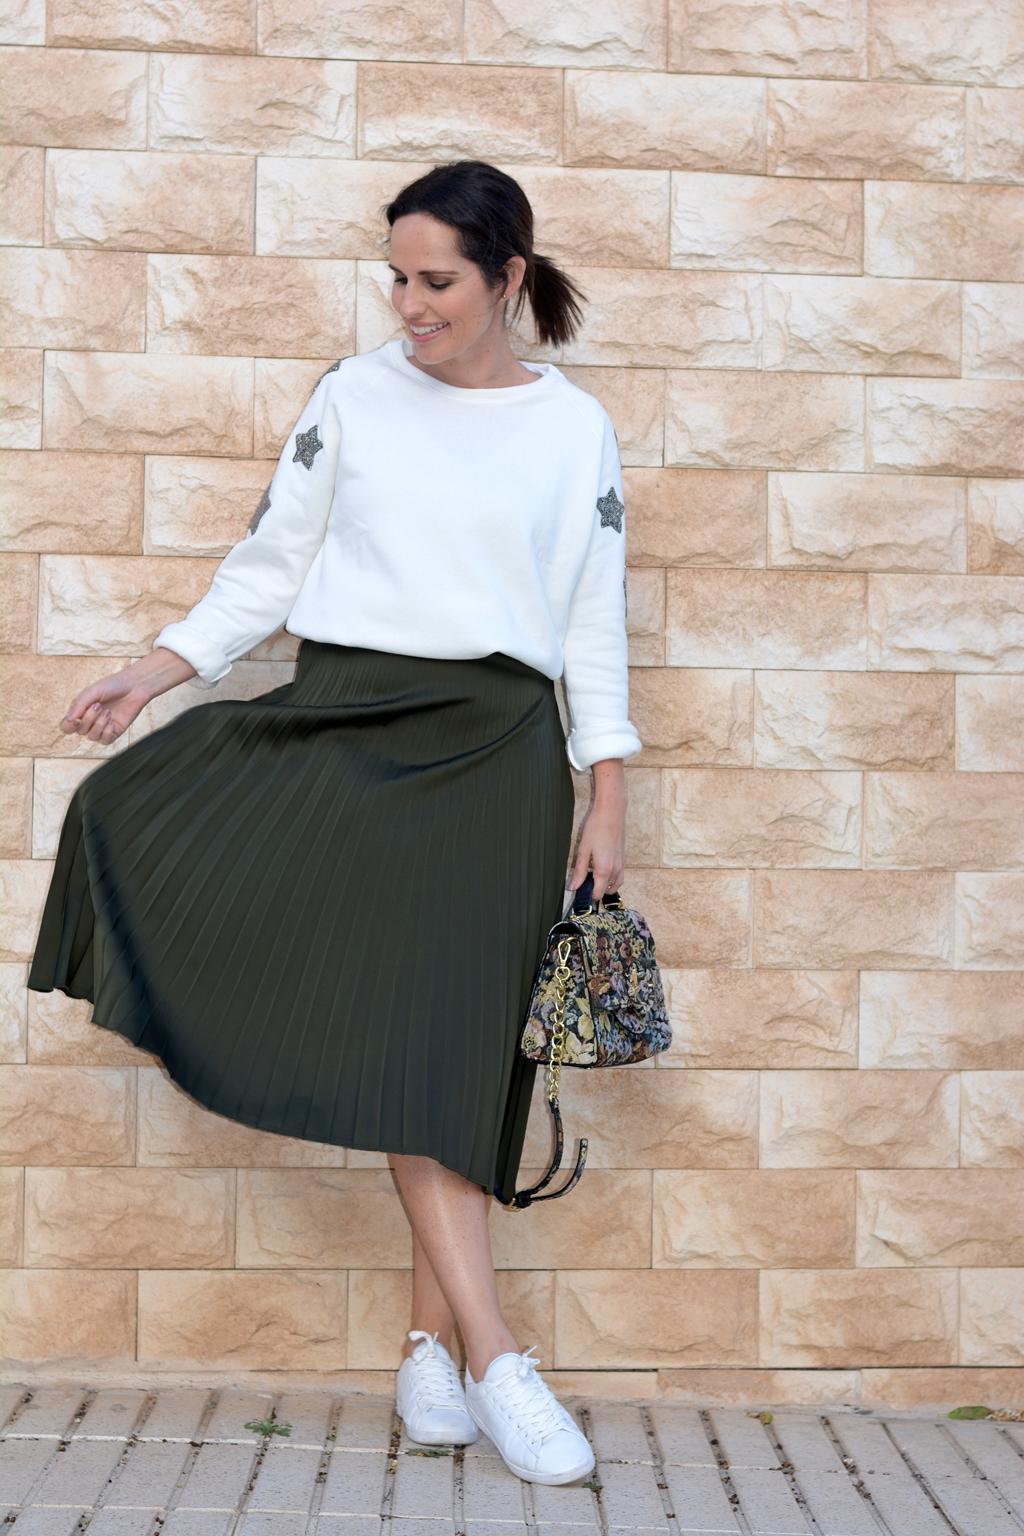 falda-midi-stradivarius-outfit-street-style